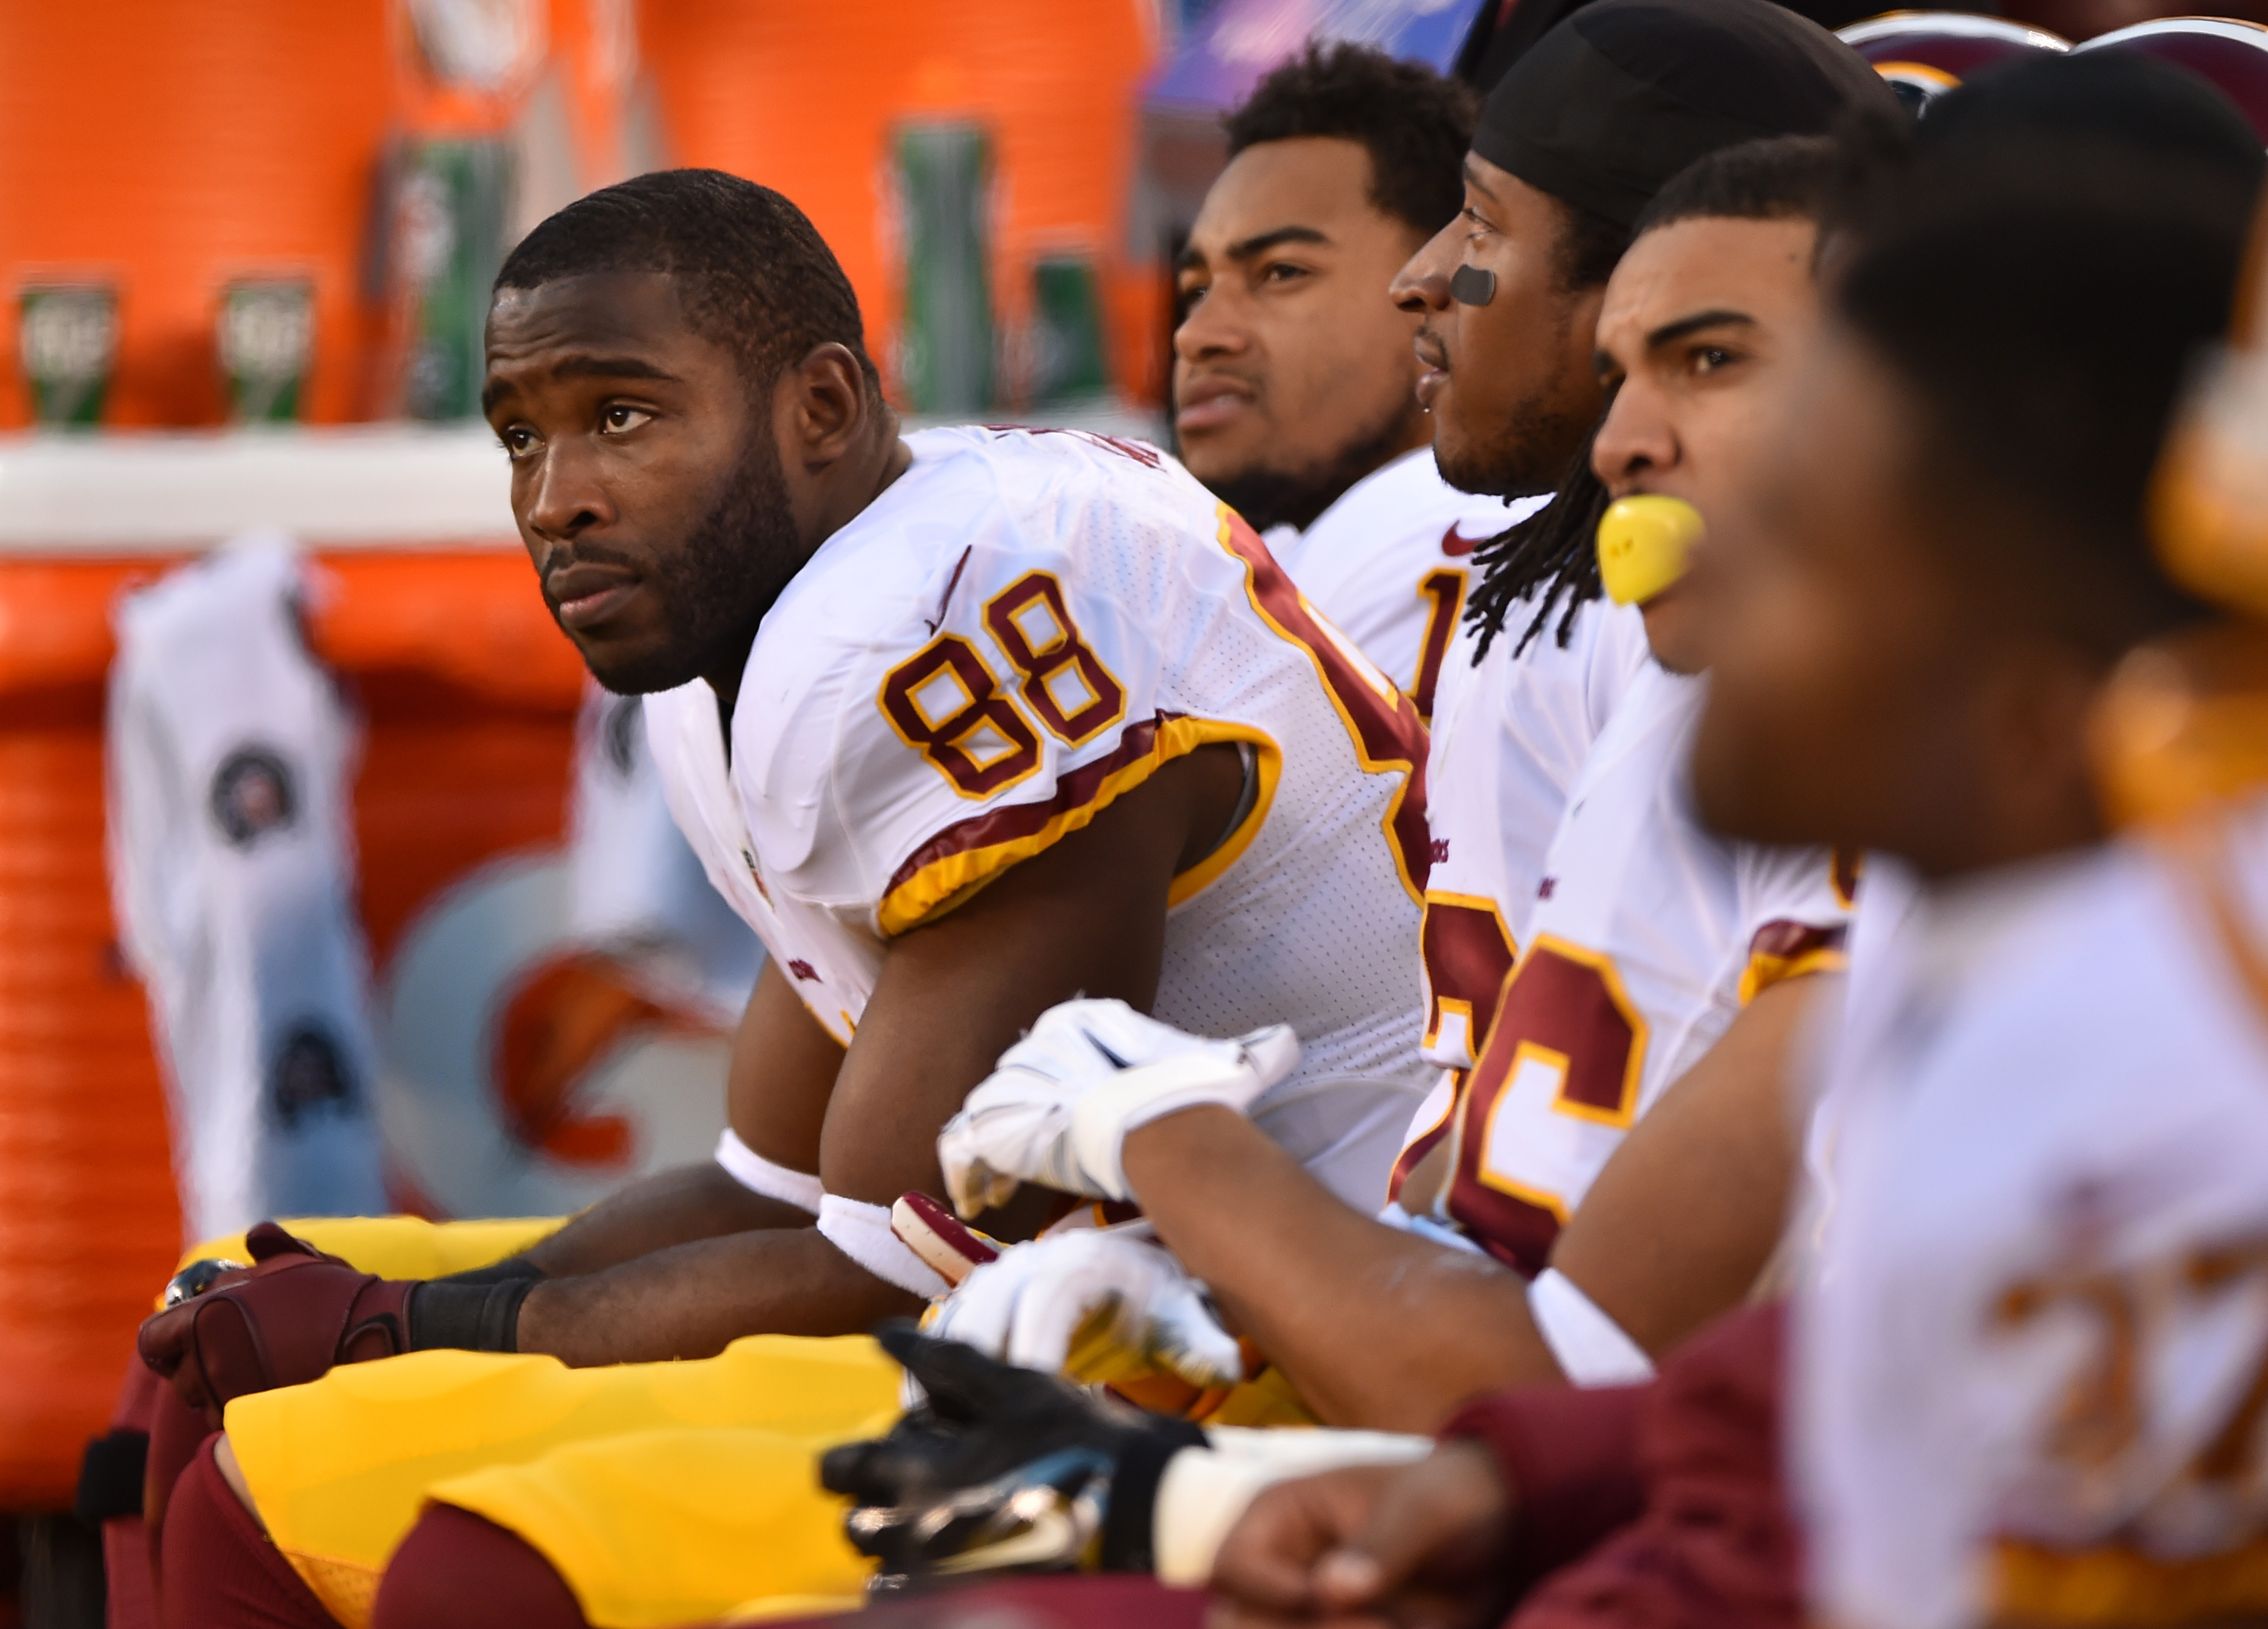 NFL Footbal - Washington Redskins at New York Giants